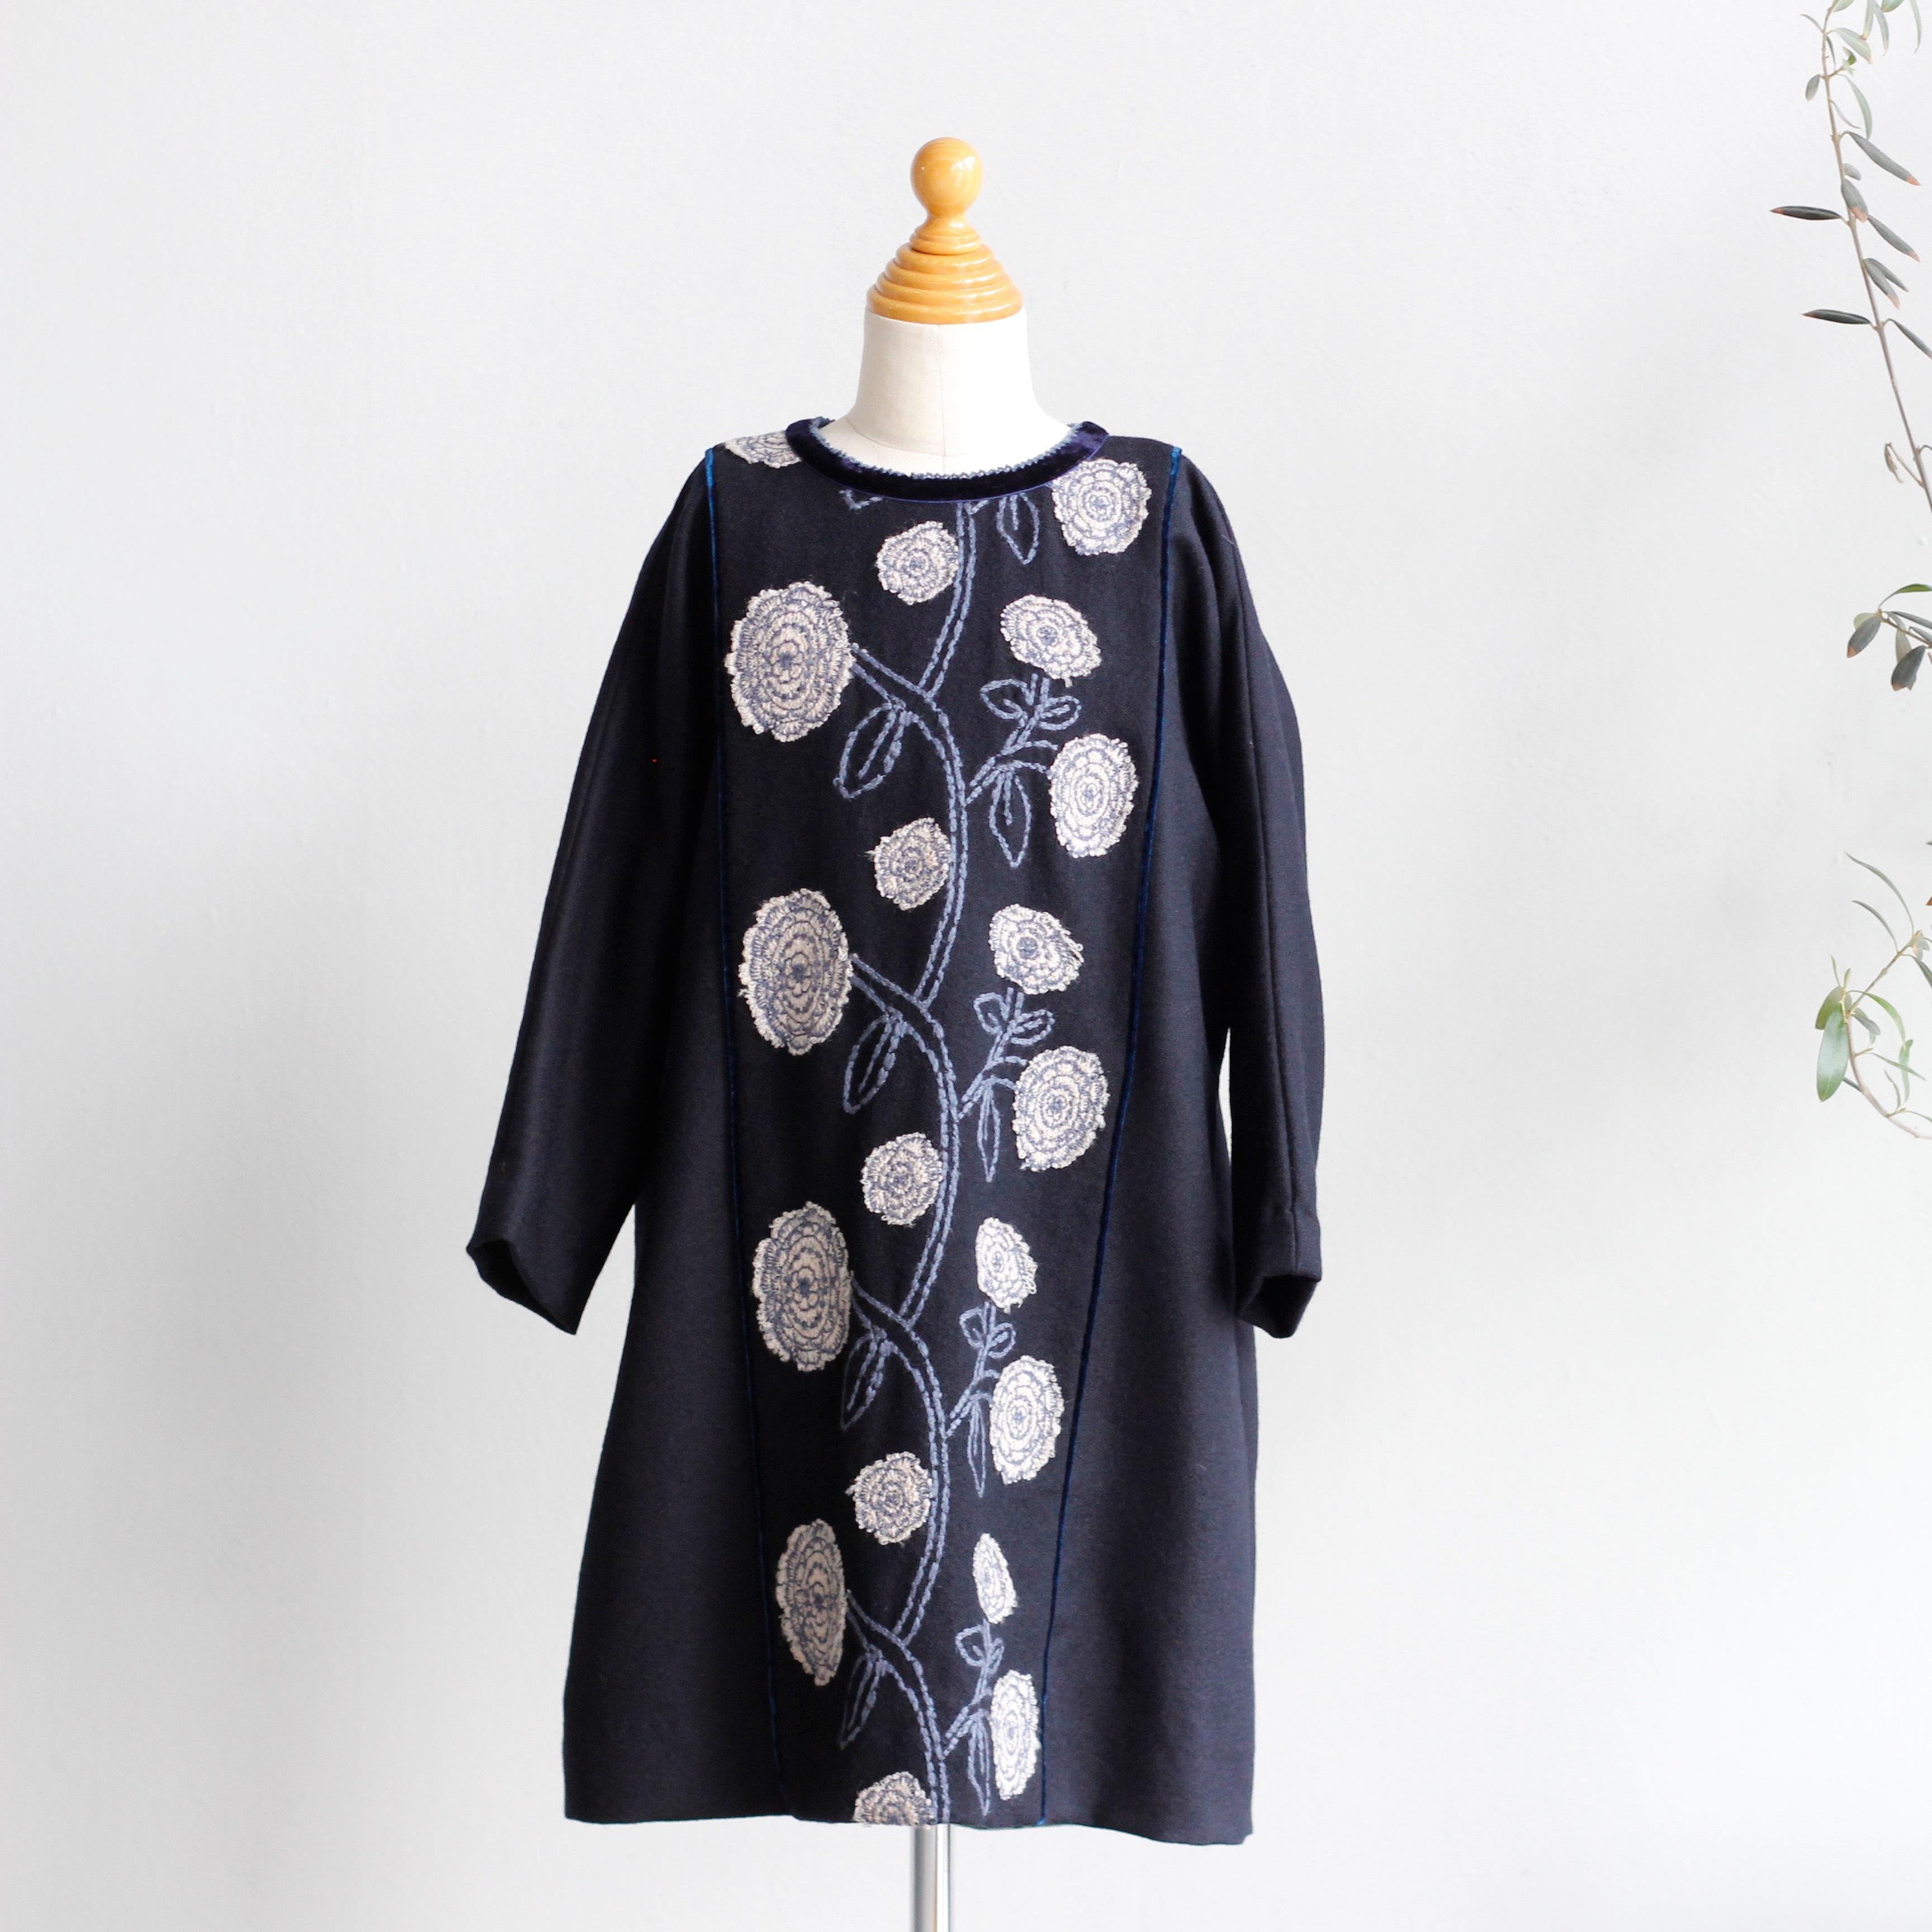 《mina perhonen 2016AW》giardino ワンピース / navy / 110・120cm